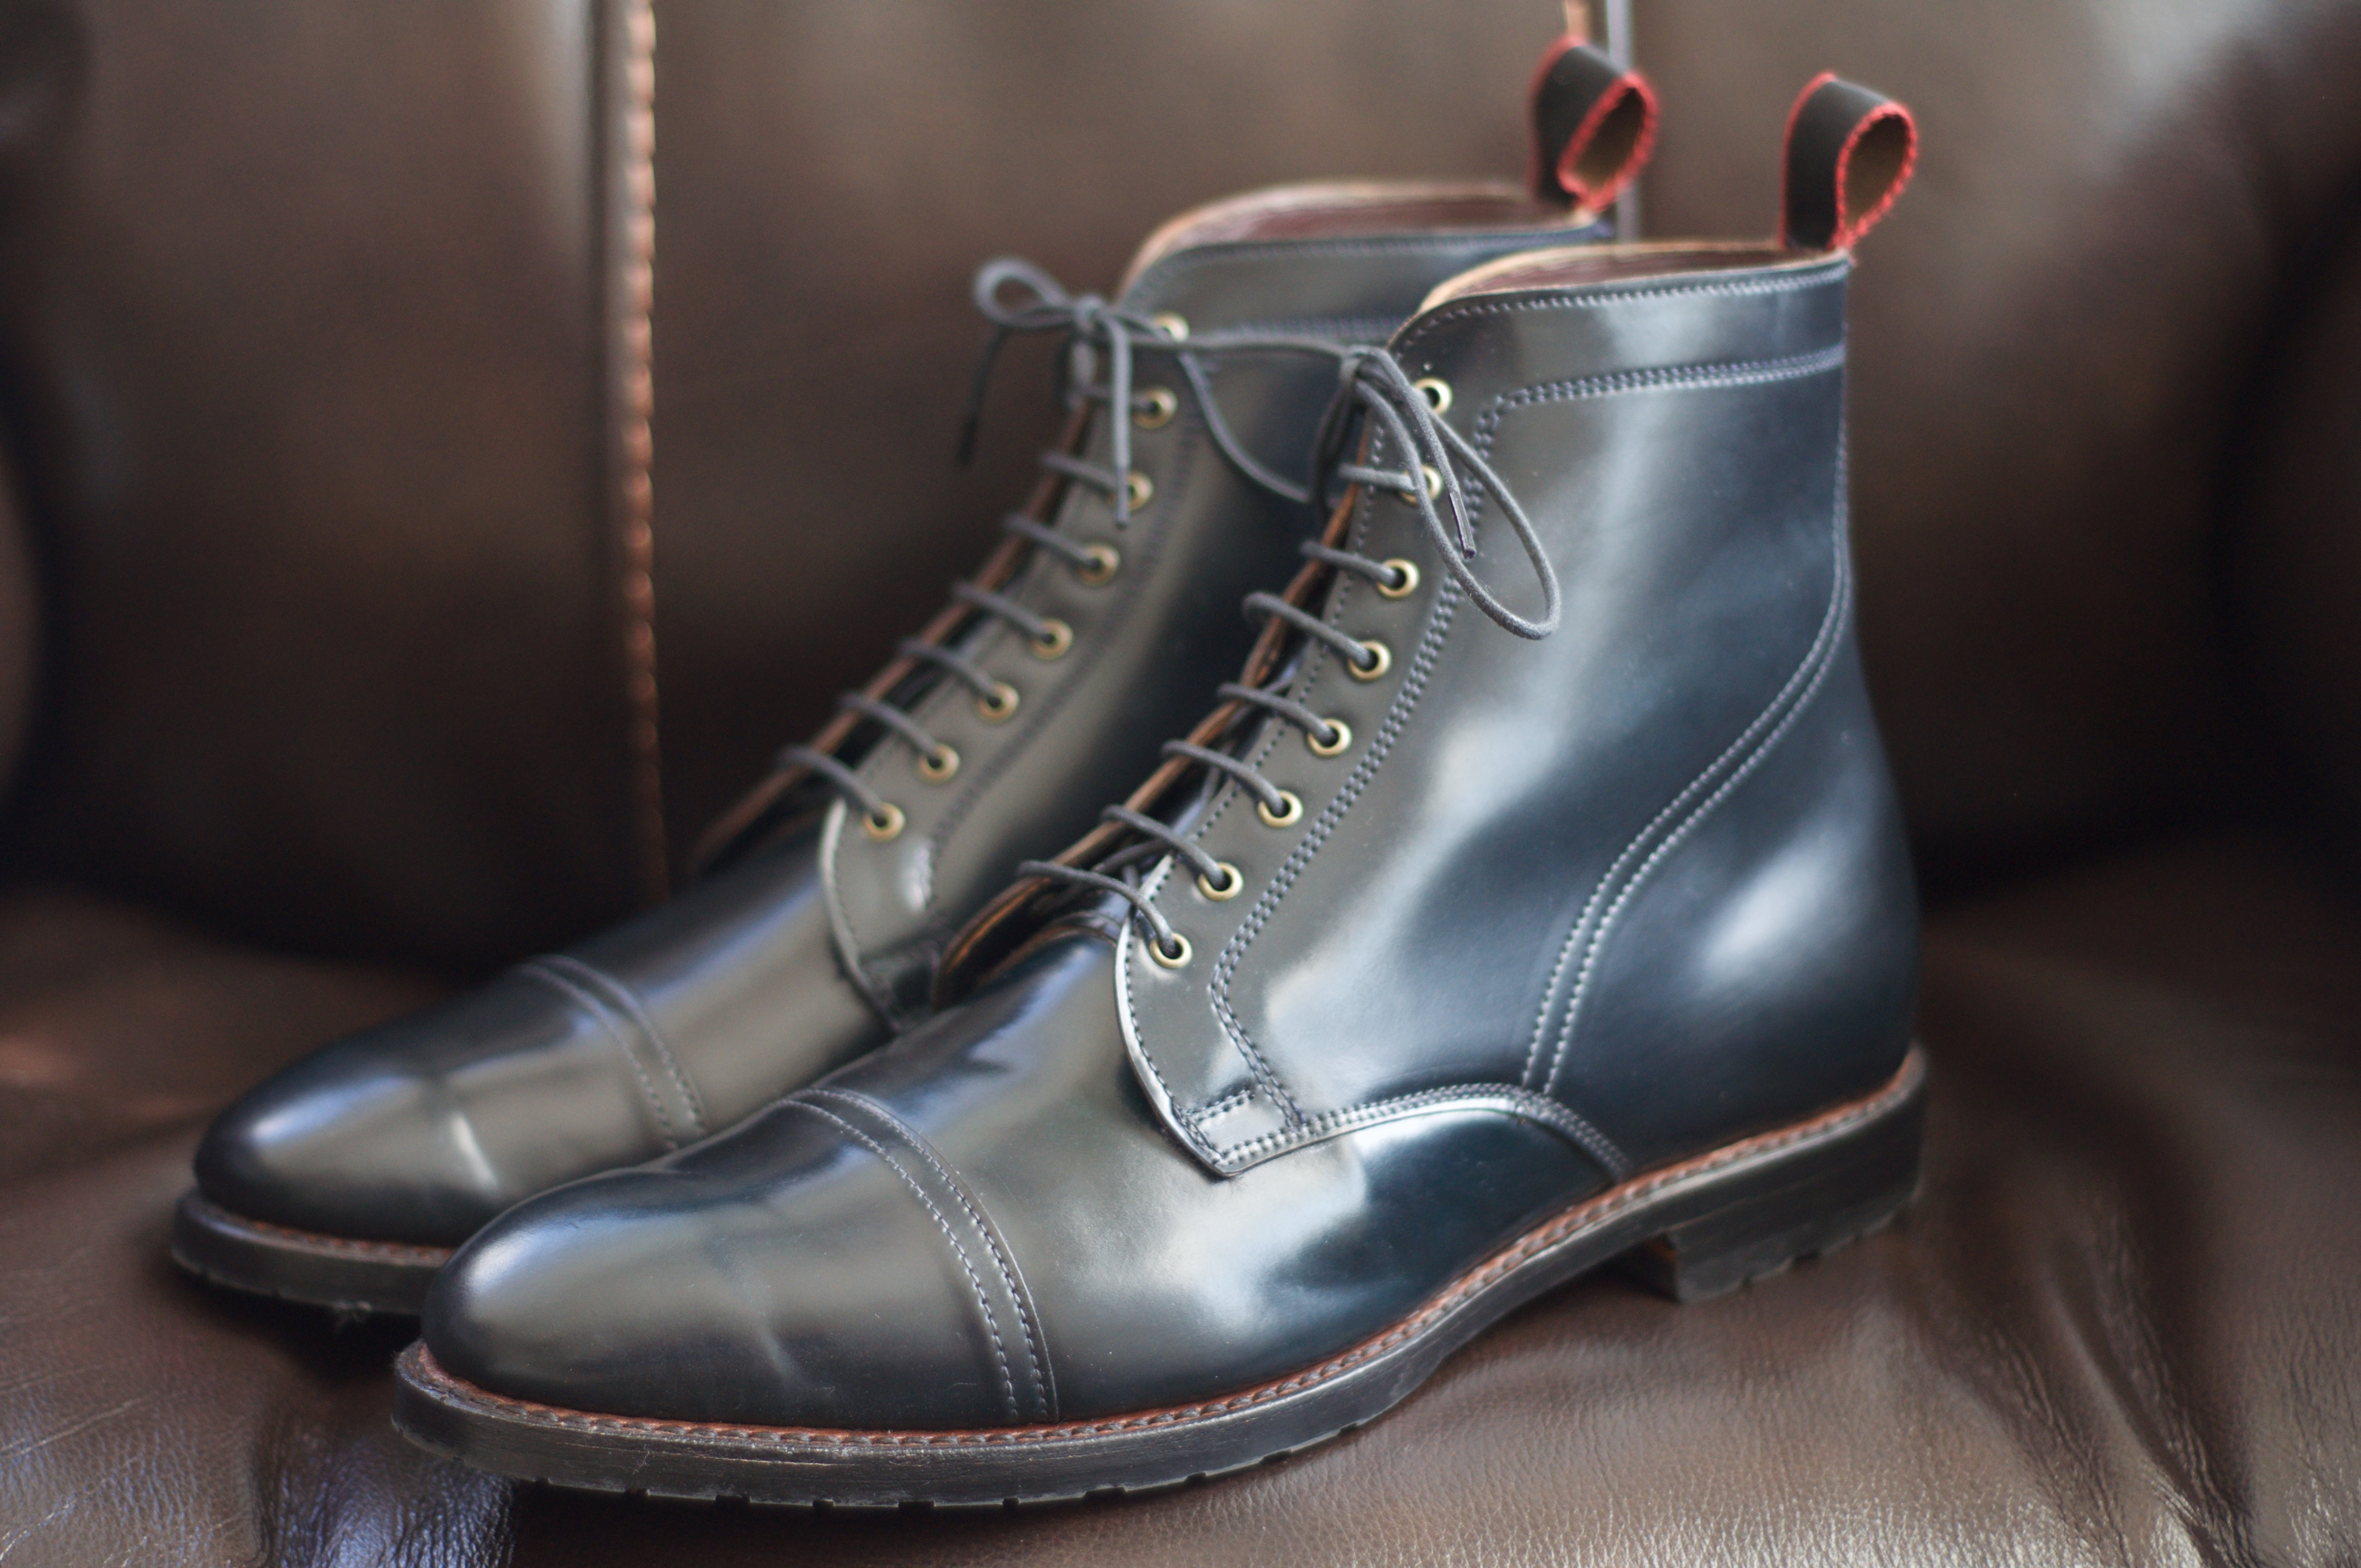 78ce40612d0 SOLD  Allen Edmonds Navy Shell Cordovan First Avenue Boot – 10.5D – Alden  of San Diego